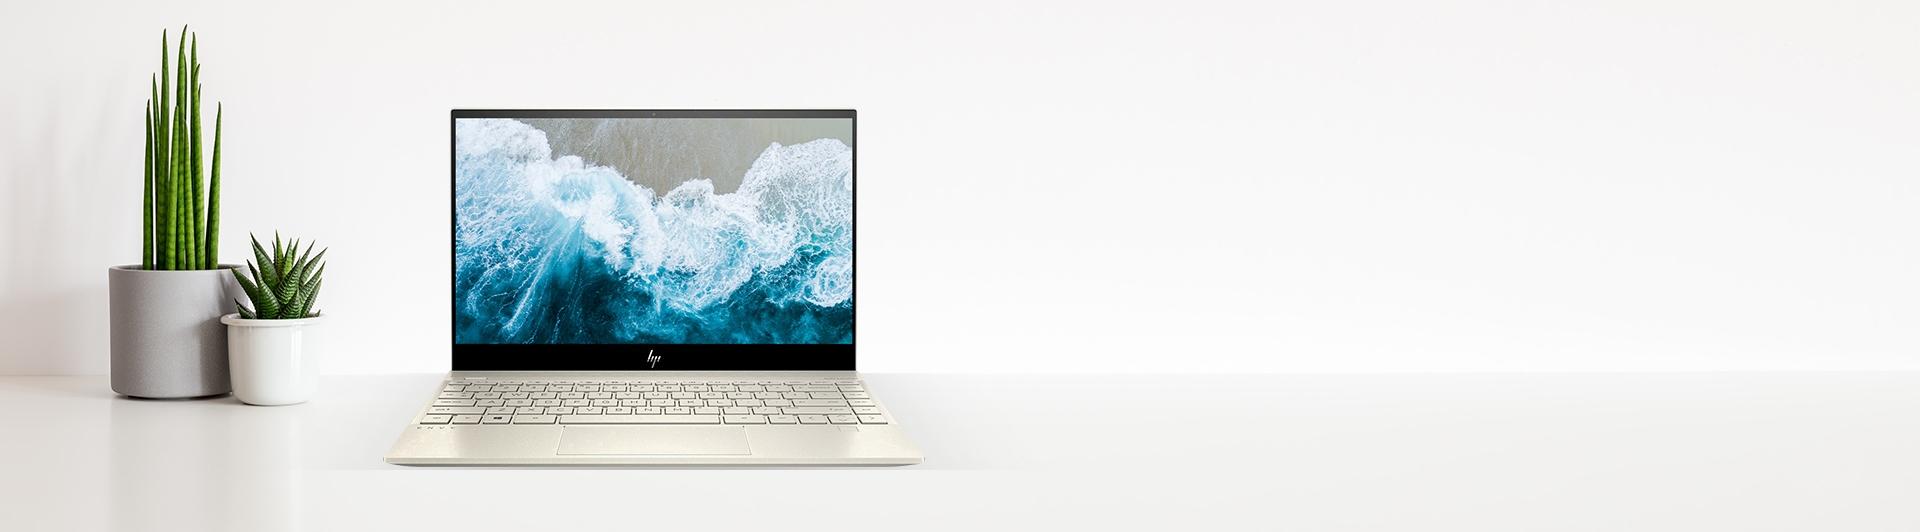 Laptop HP Envy 13-AQ1023TU i7-10510U 13.3 inch 8QN84PA